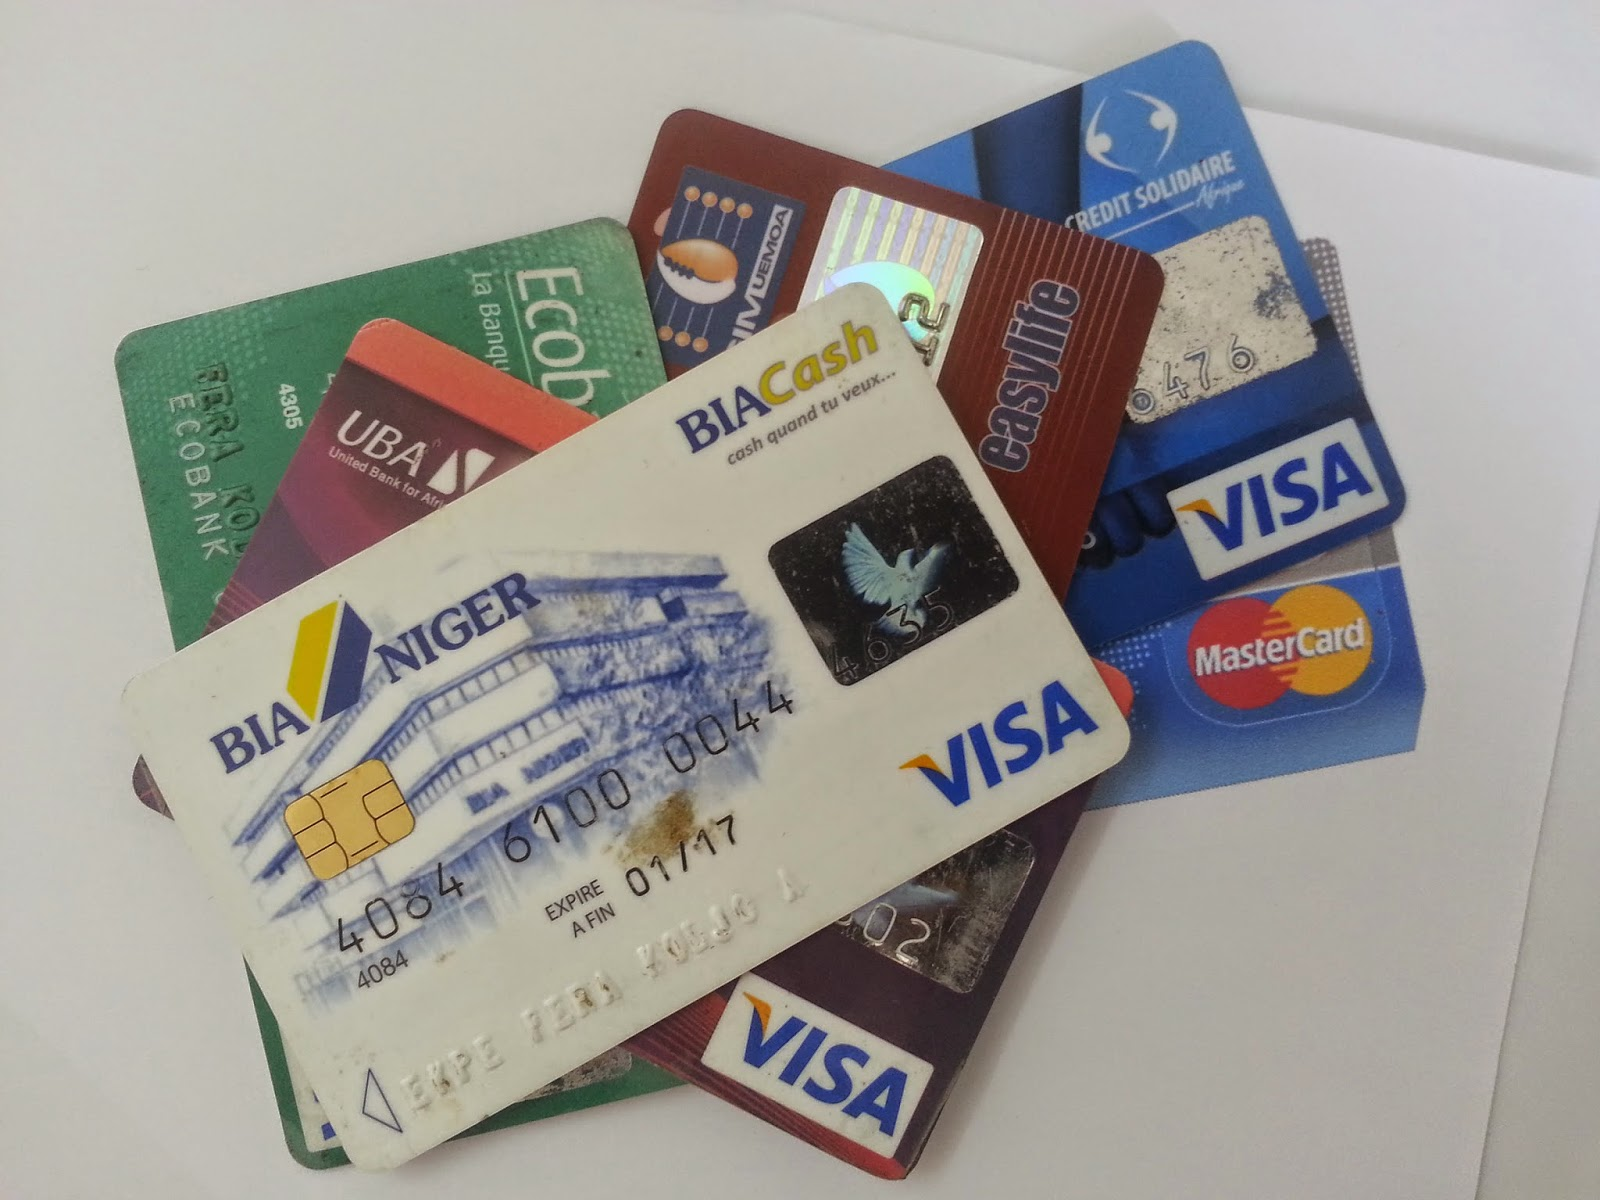 Carte Bancaire Prepayee Rechargeable.Lome Actualites Parlons De Carte Bancaire Prepayee